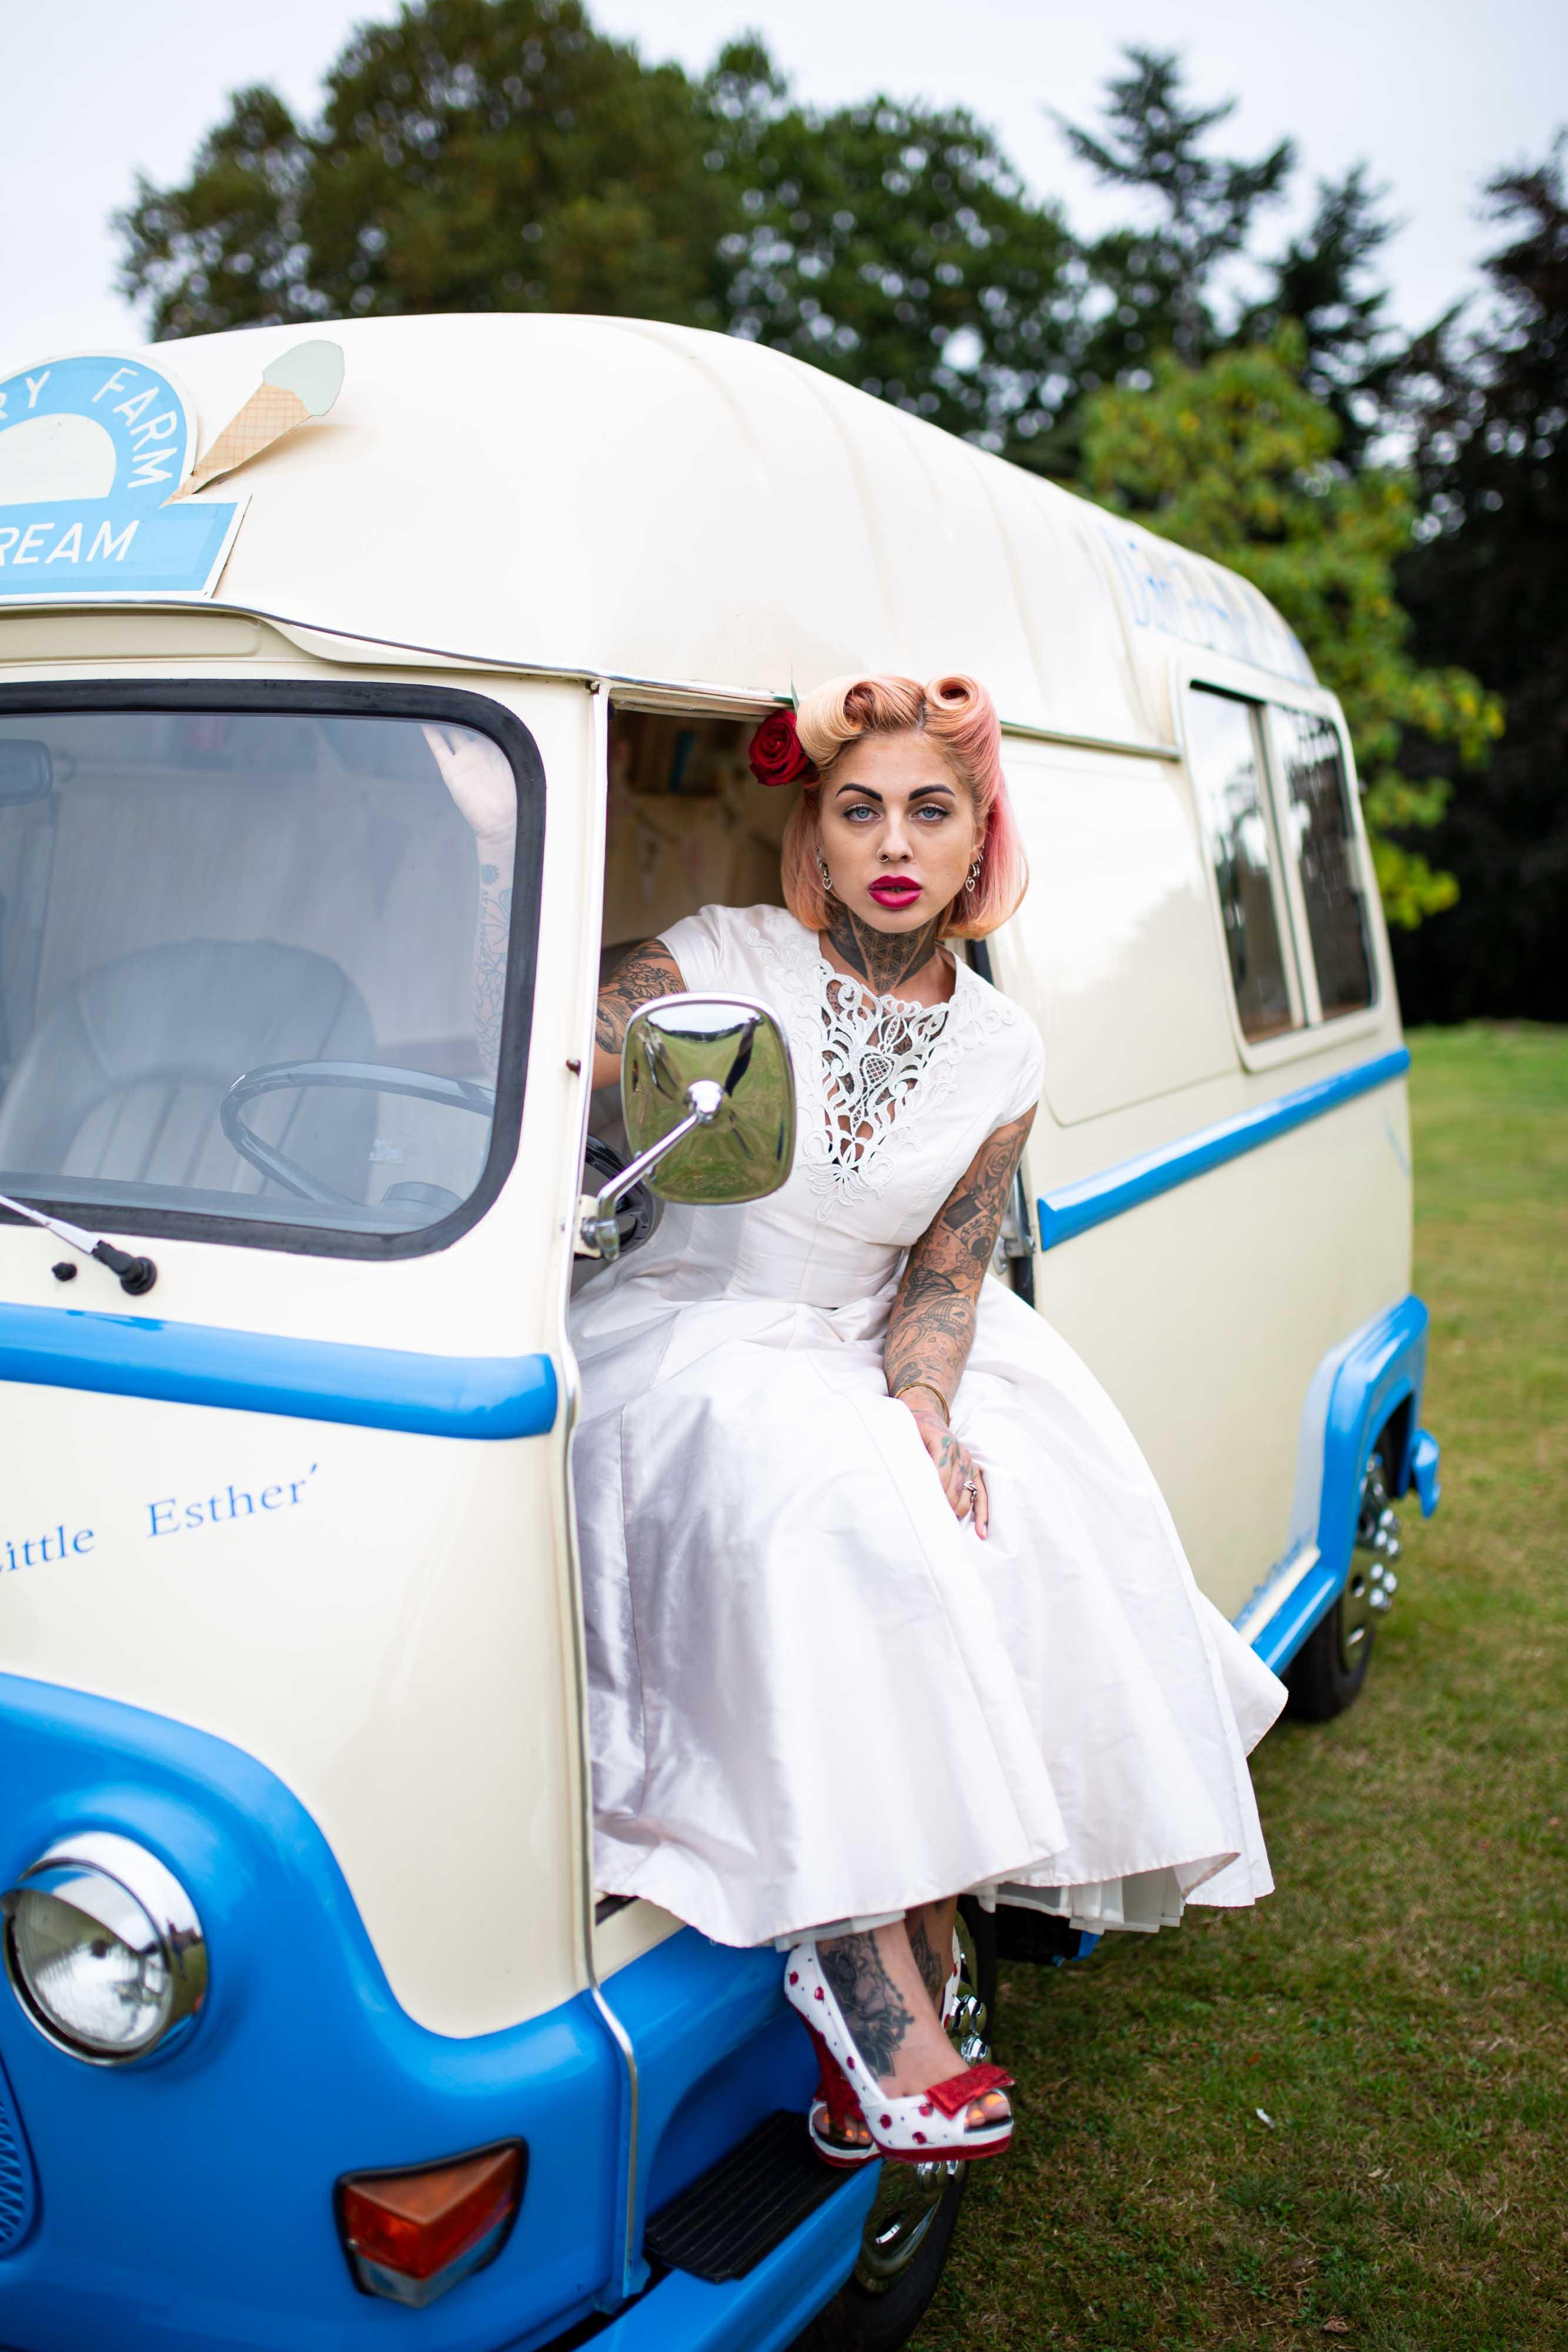 iconic wedding looks- music themed wedding- unconventional wedding- alternative wedding- wedding ice cream van- retro wedding dress- retro bride- rock and roll wedding dress- lindy bop wedding dress